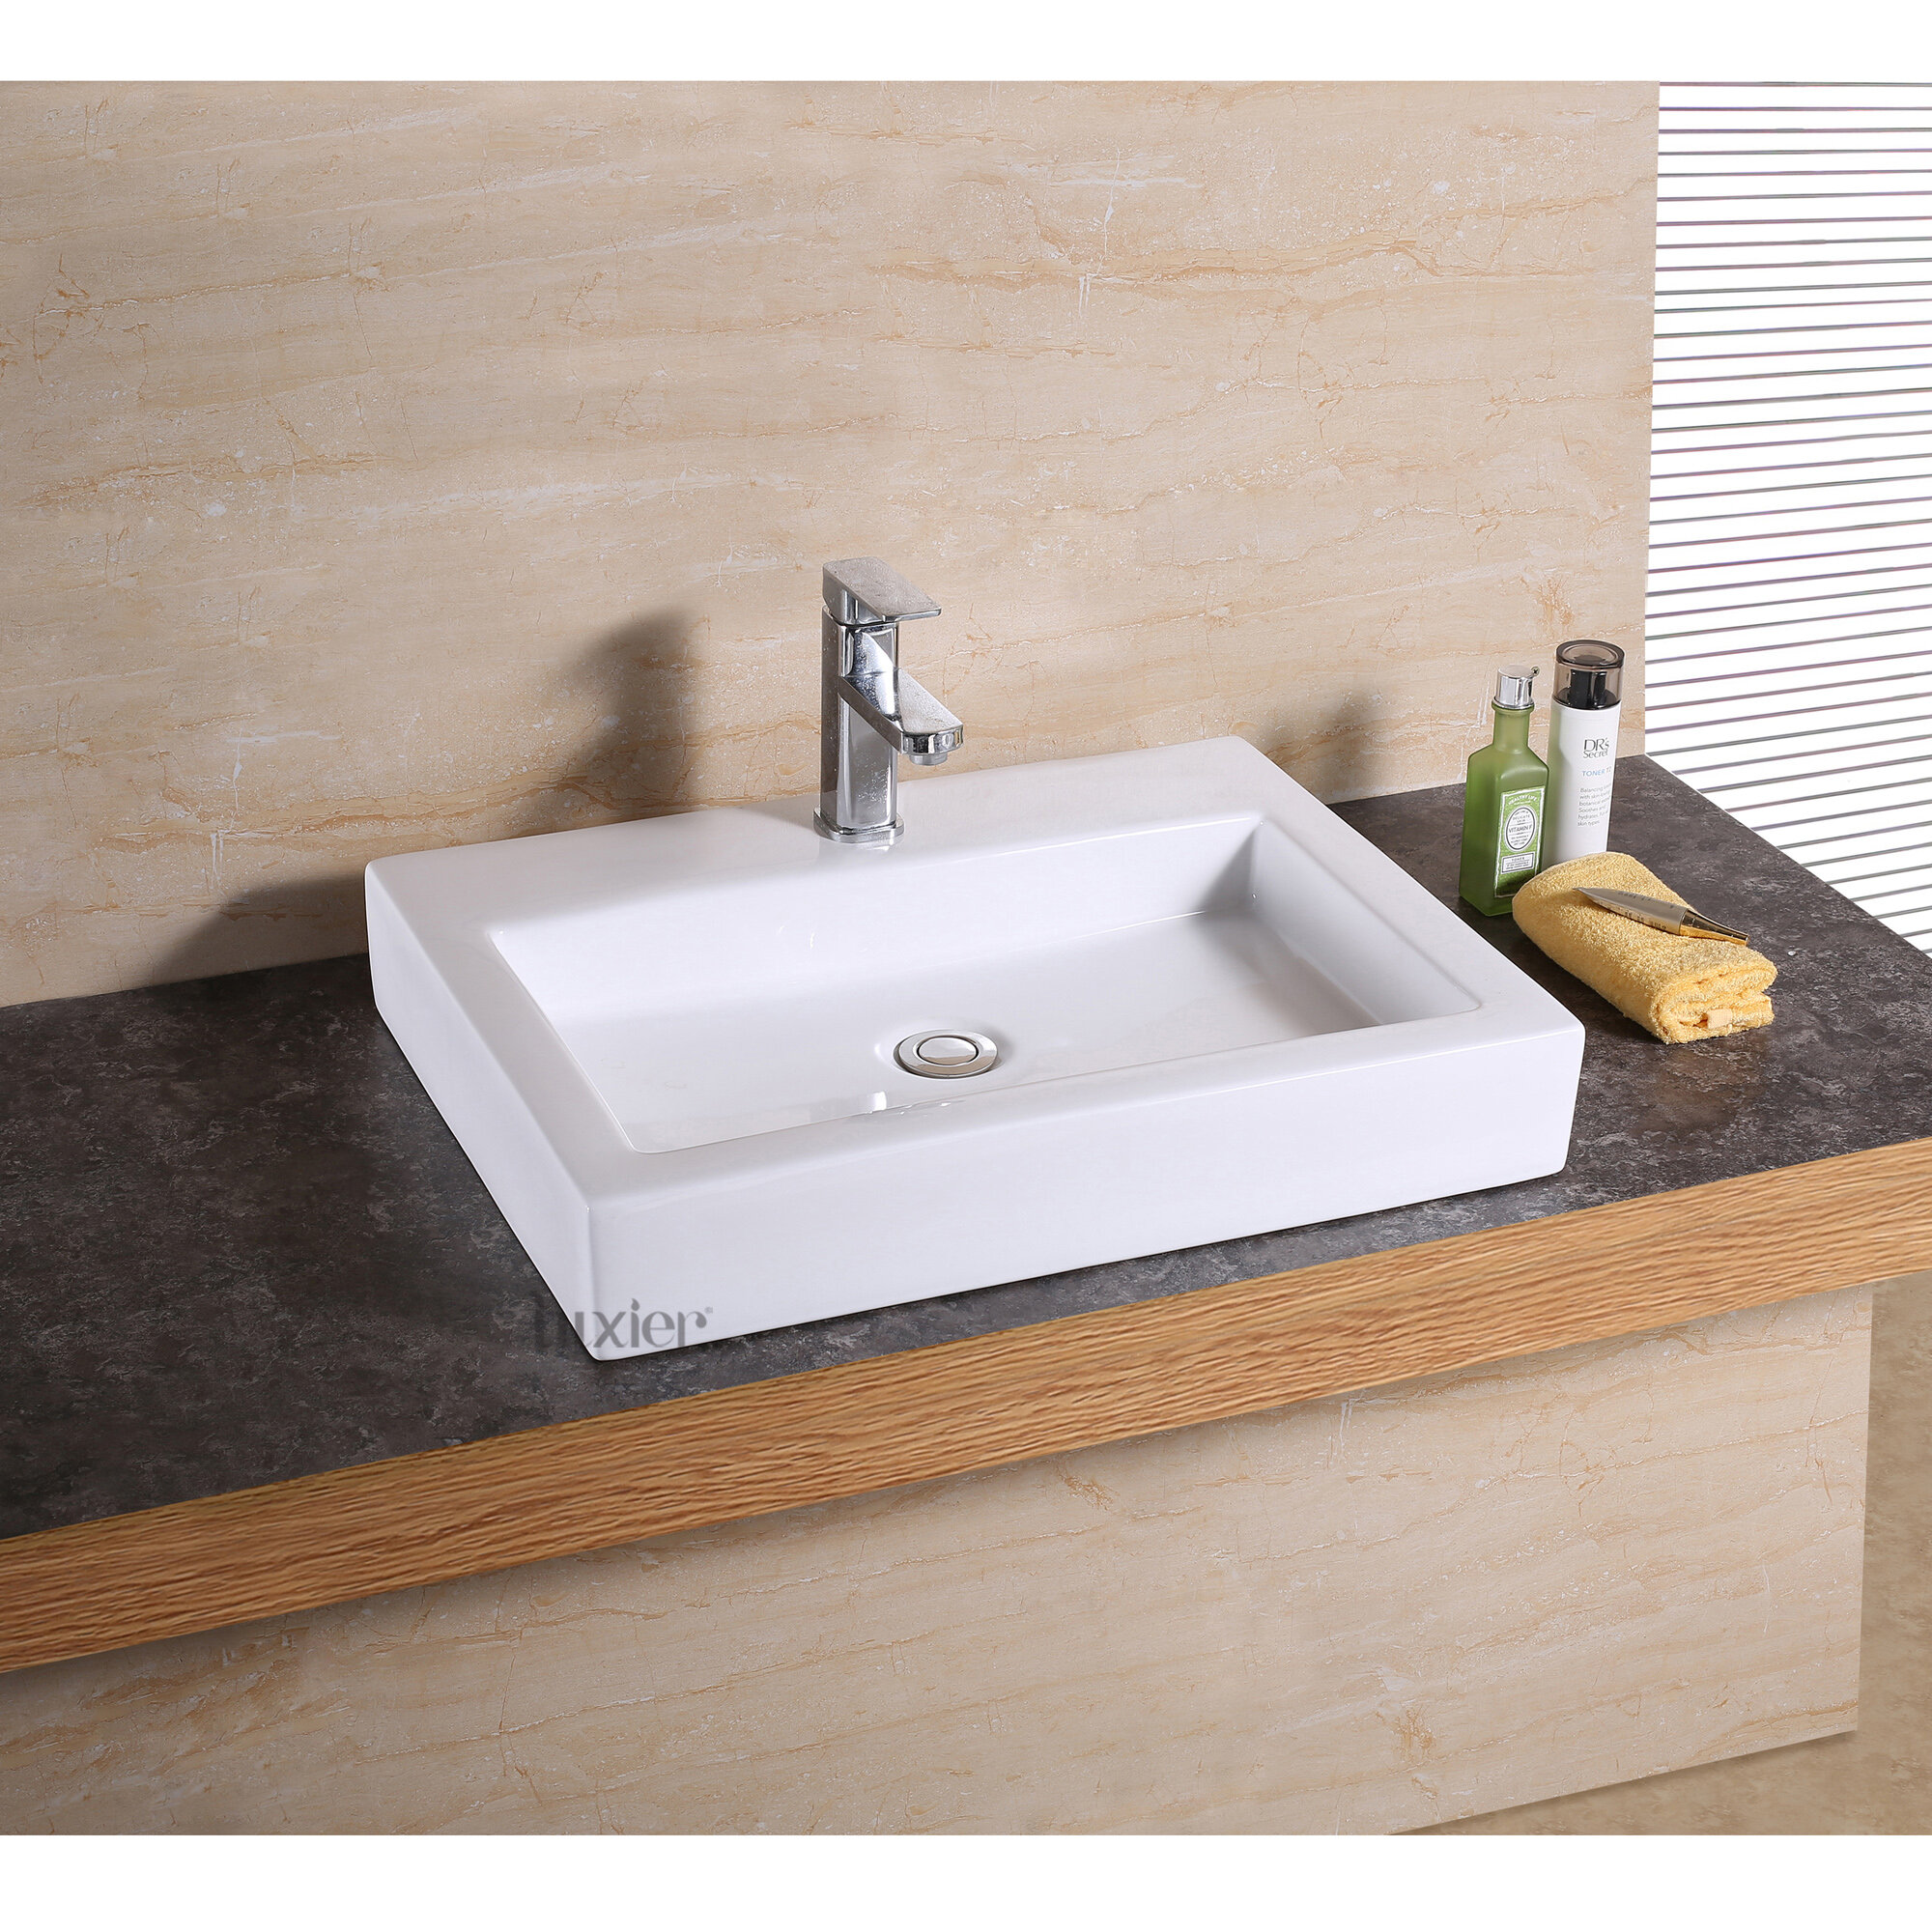 Luxier Glazed White Ceramic Rectangular Vessel Bathroom Sink Reviews Wayfair